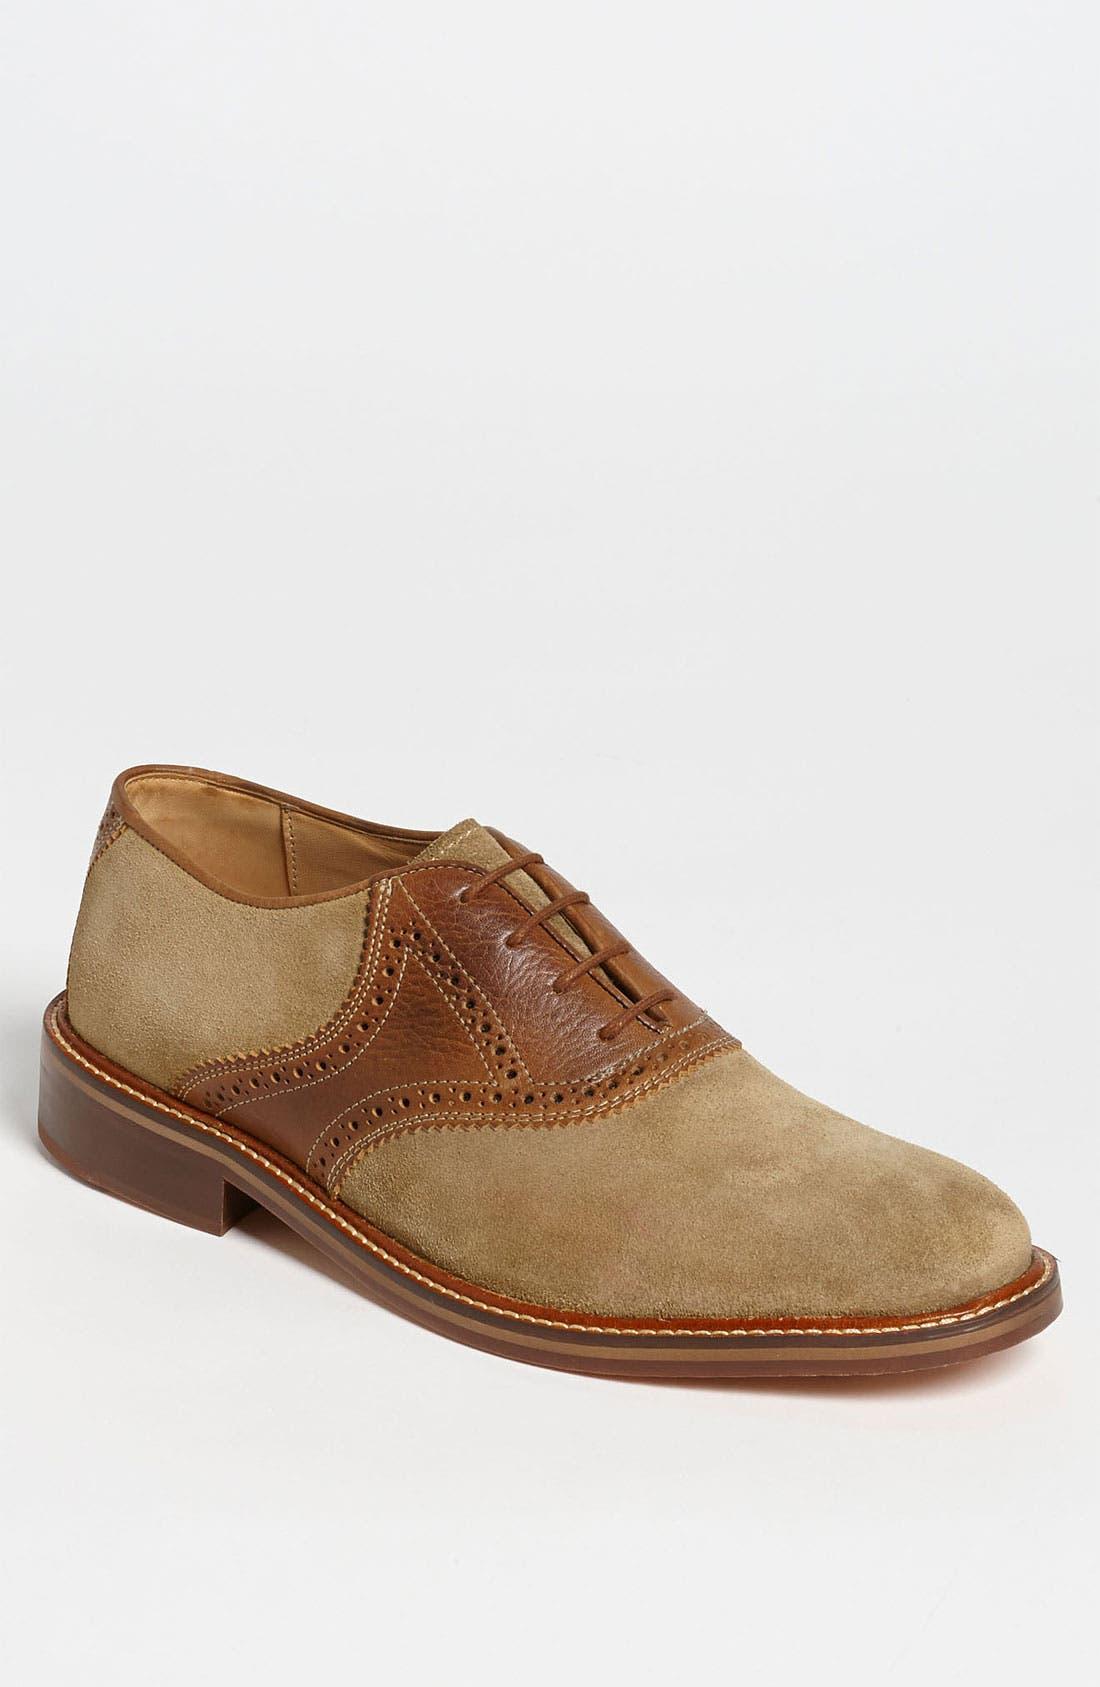 Alternate Image 1 Selected - Martin Dingman 'George' Saddle Shoe